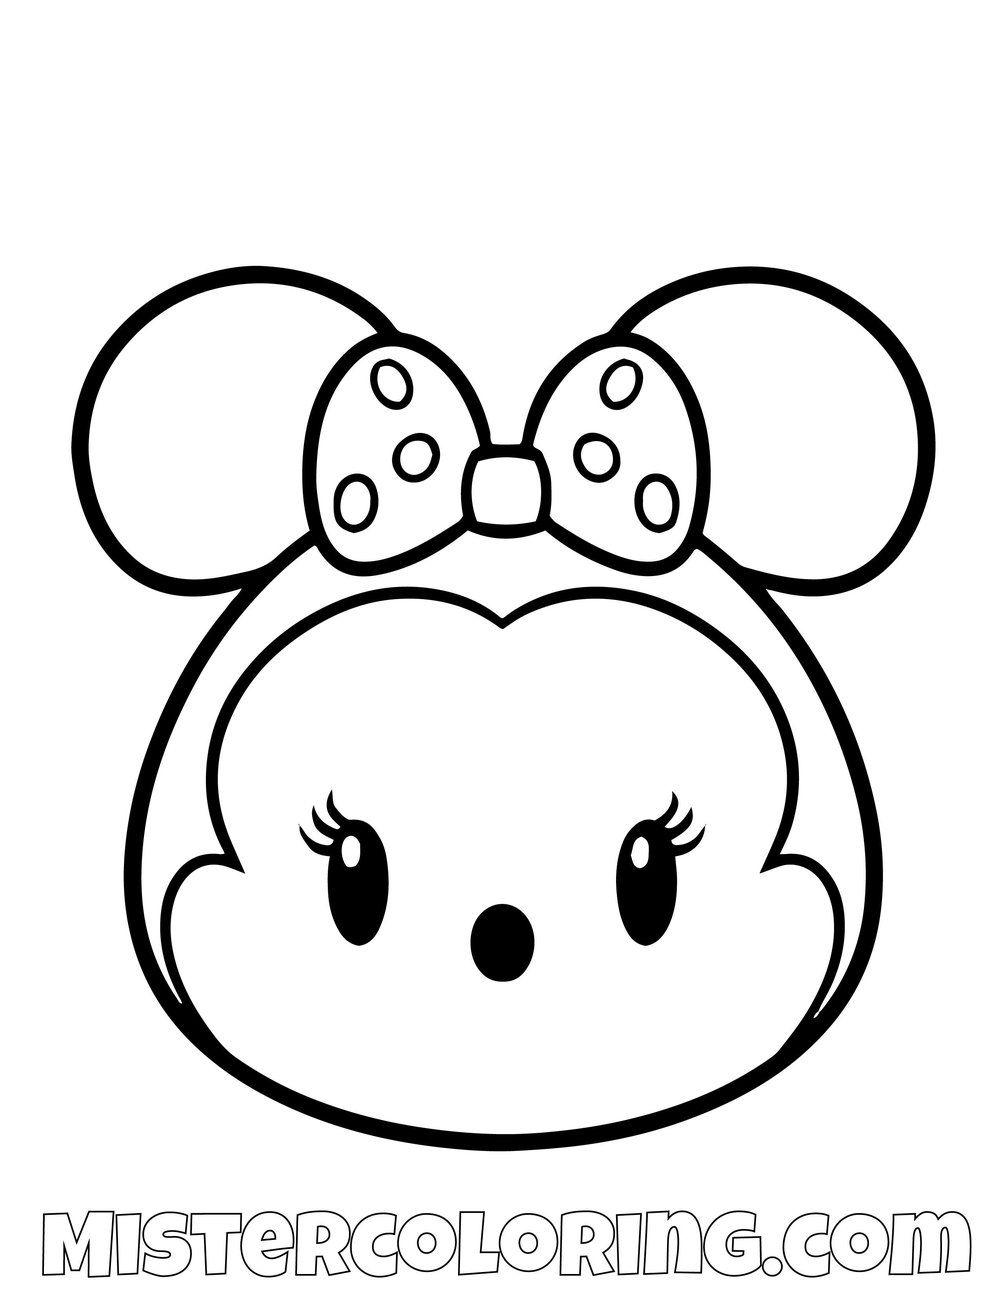 Minnie Mouse From Mickey Mouse Tsum Tsum Coloring Pages For Kids Lustige Malvorlagen Ausmalbilder Malvorlagen